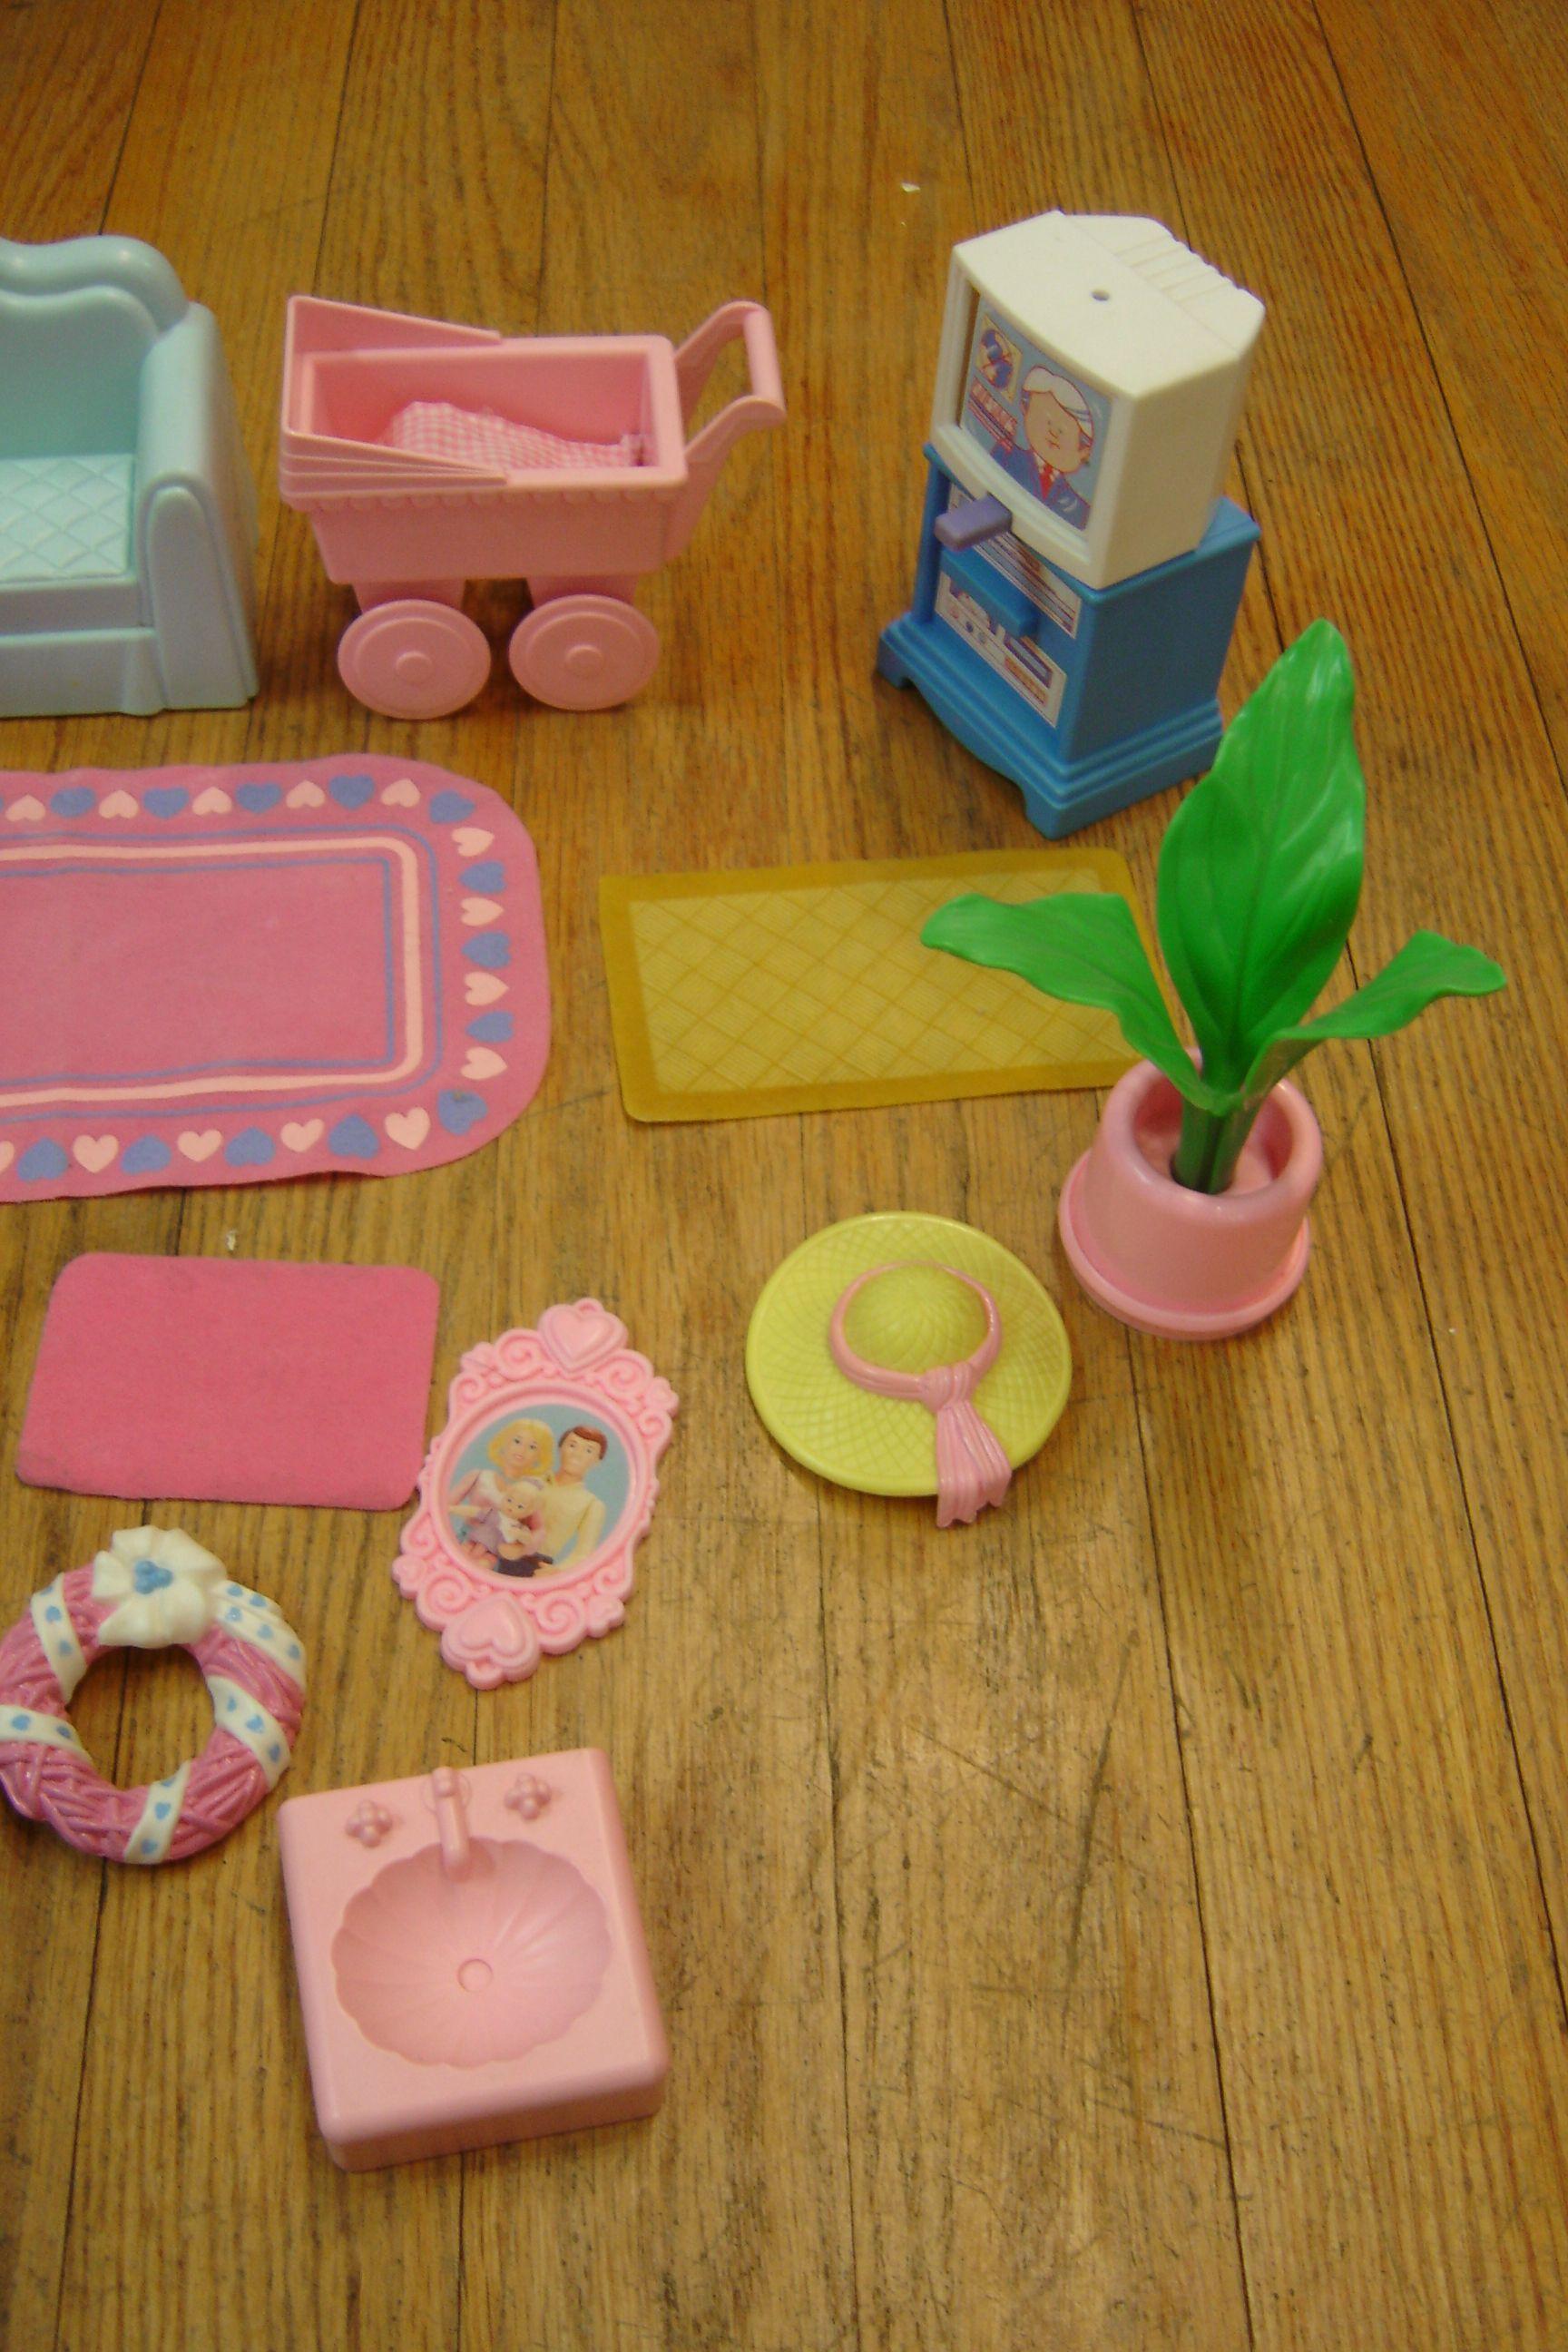 Vintage 1990 S Playskool Doll House Furniture And